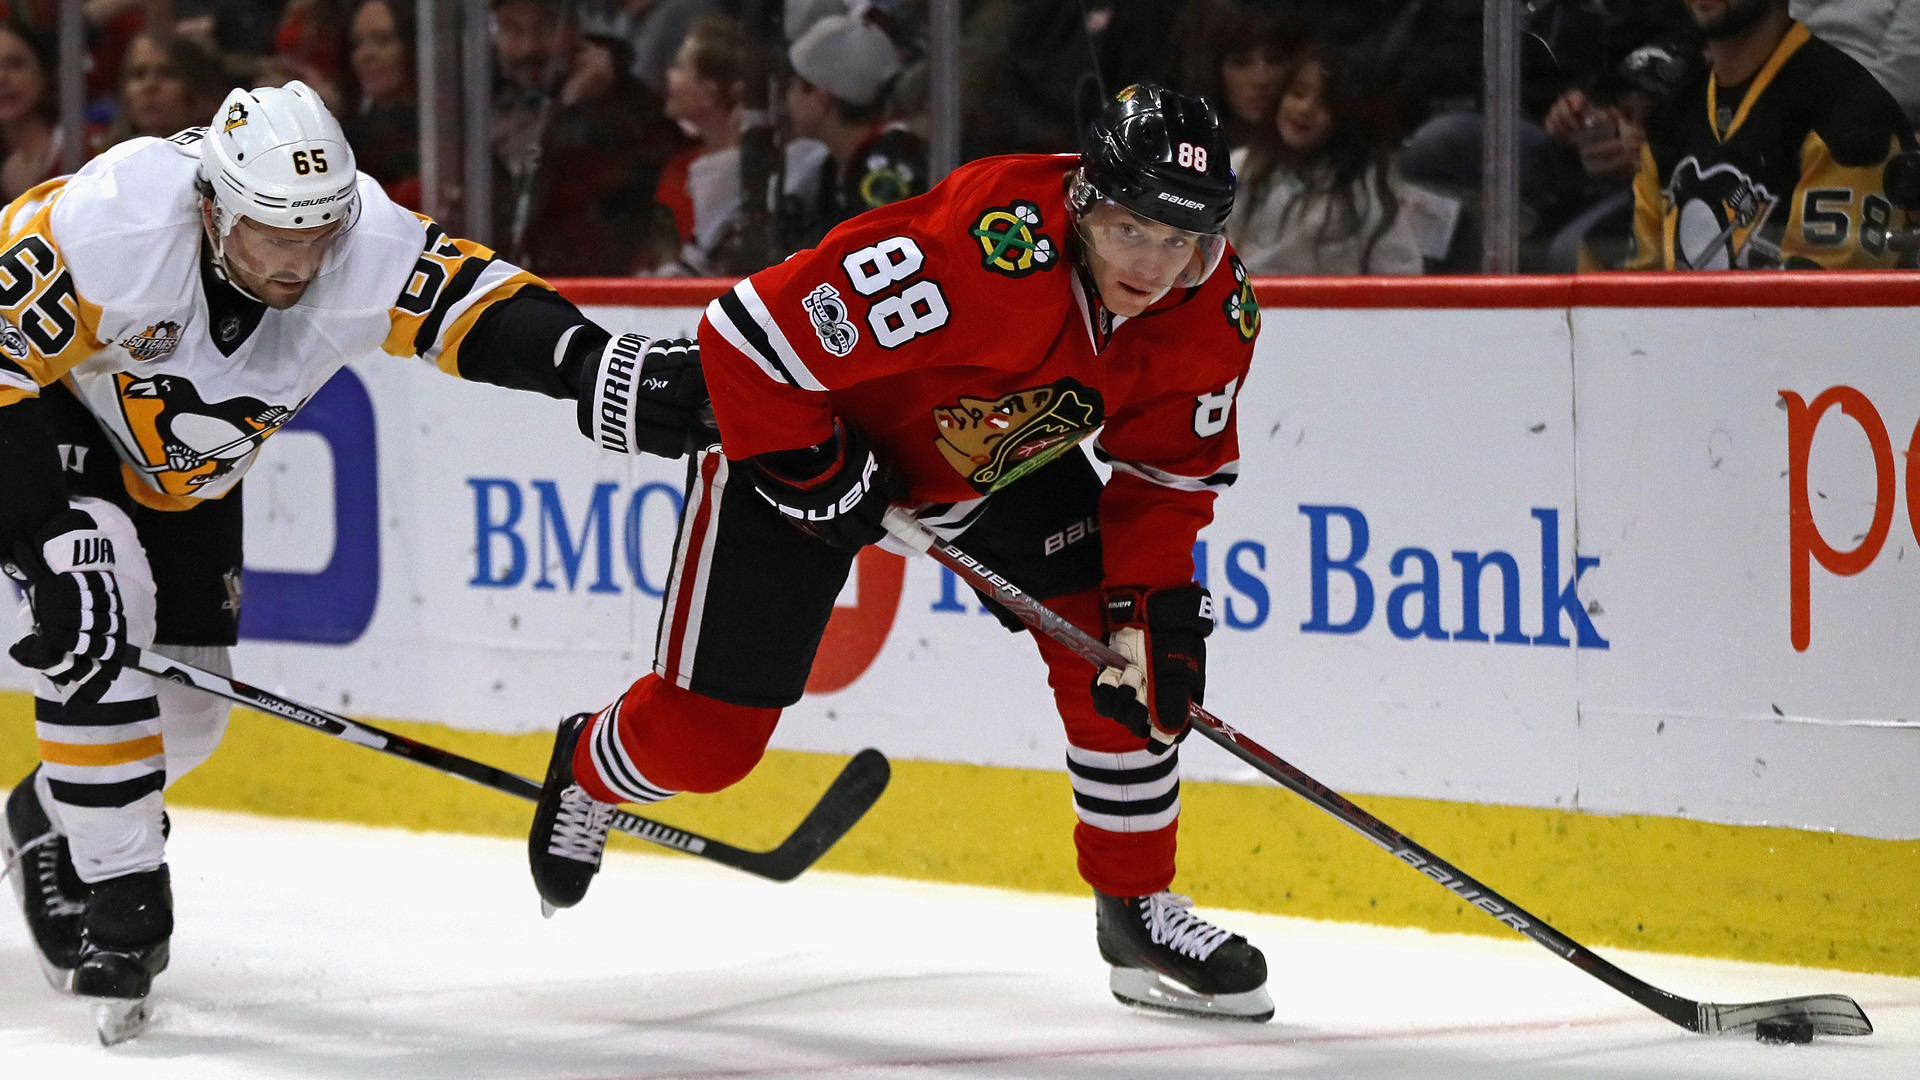 Patrick Kane hat trick carries Blackhawks past Penguins, 4-1 | NBC Sports